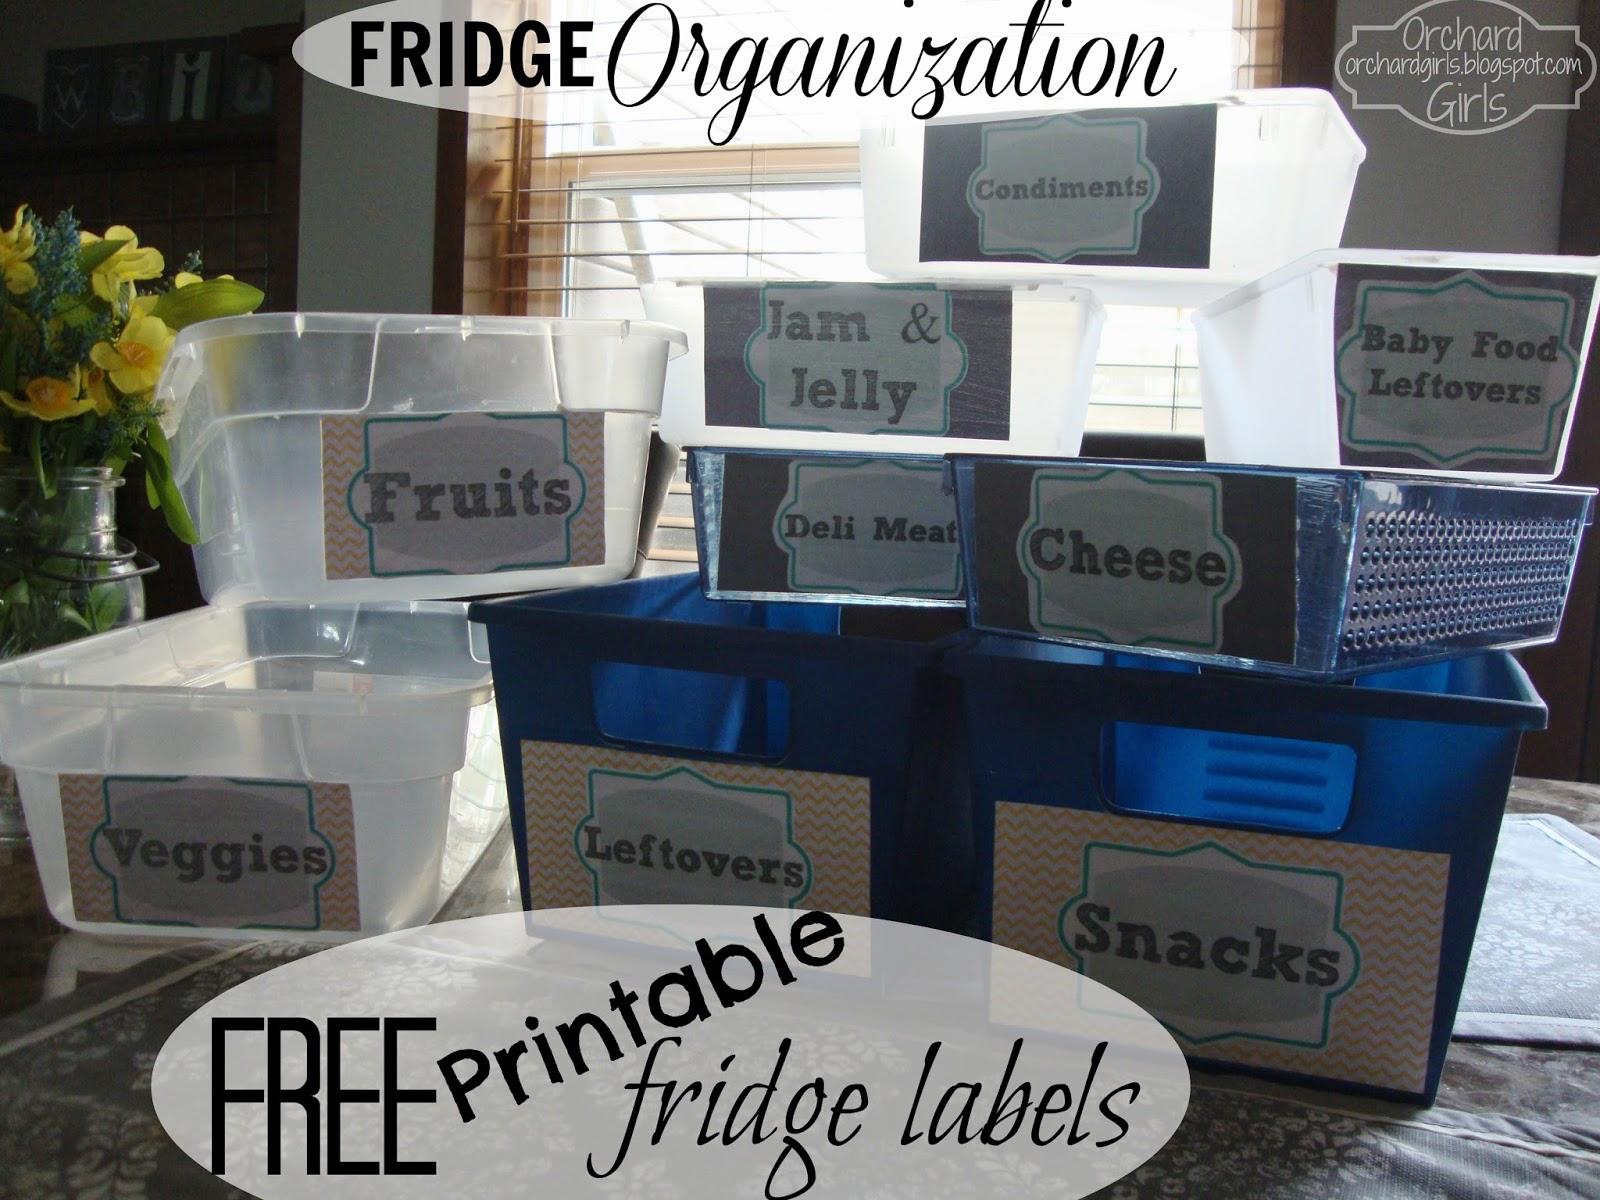 Orchard Girls Dollar Store Fridge Makeover Free